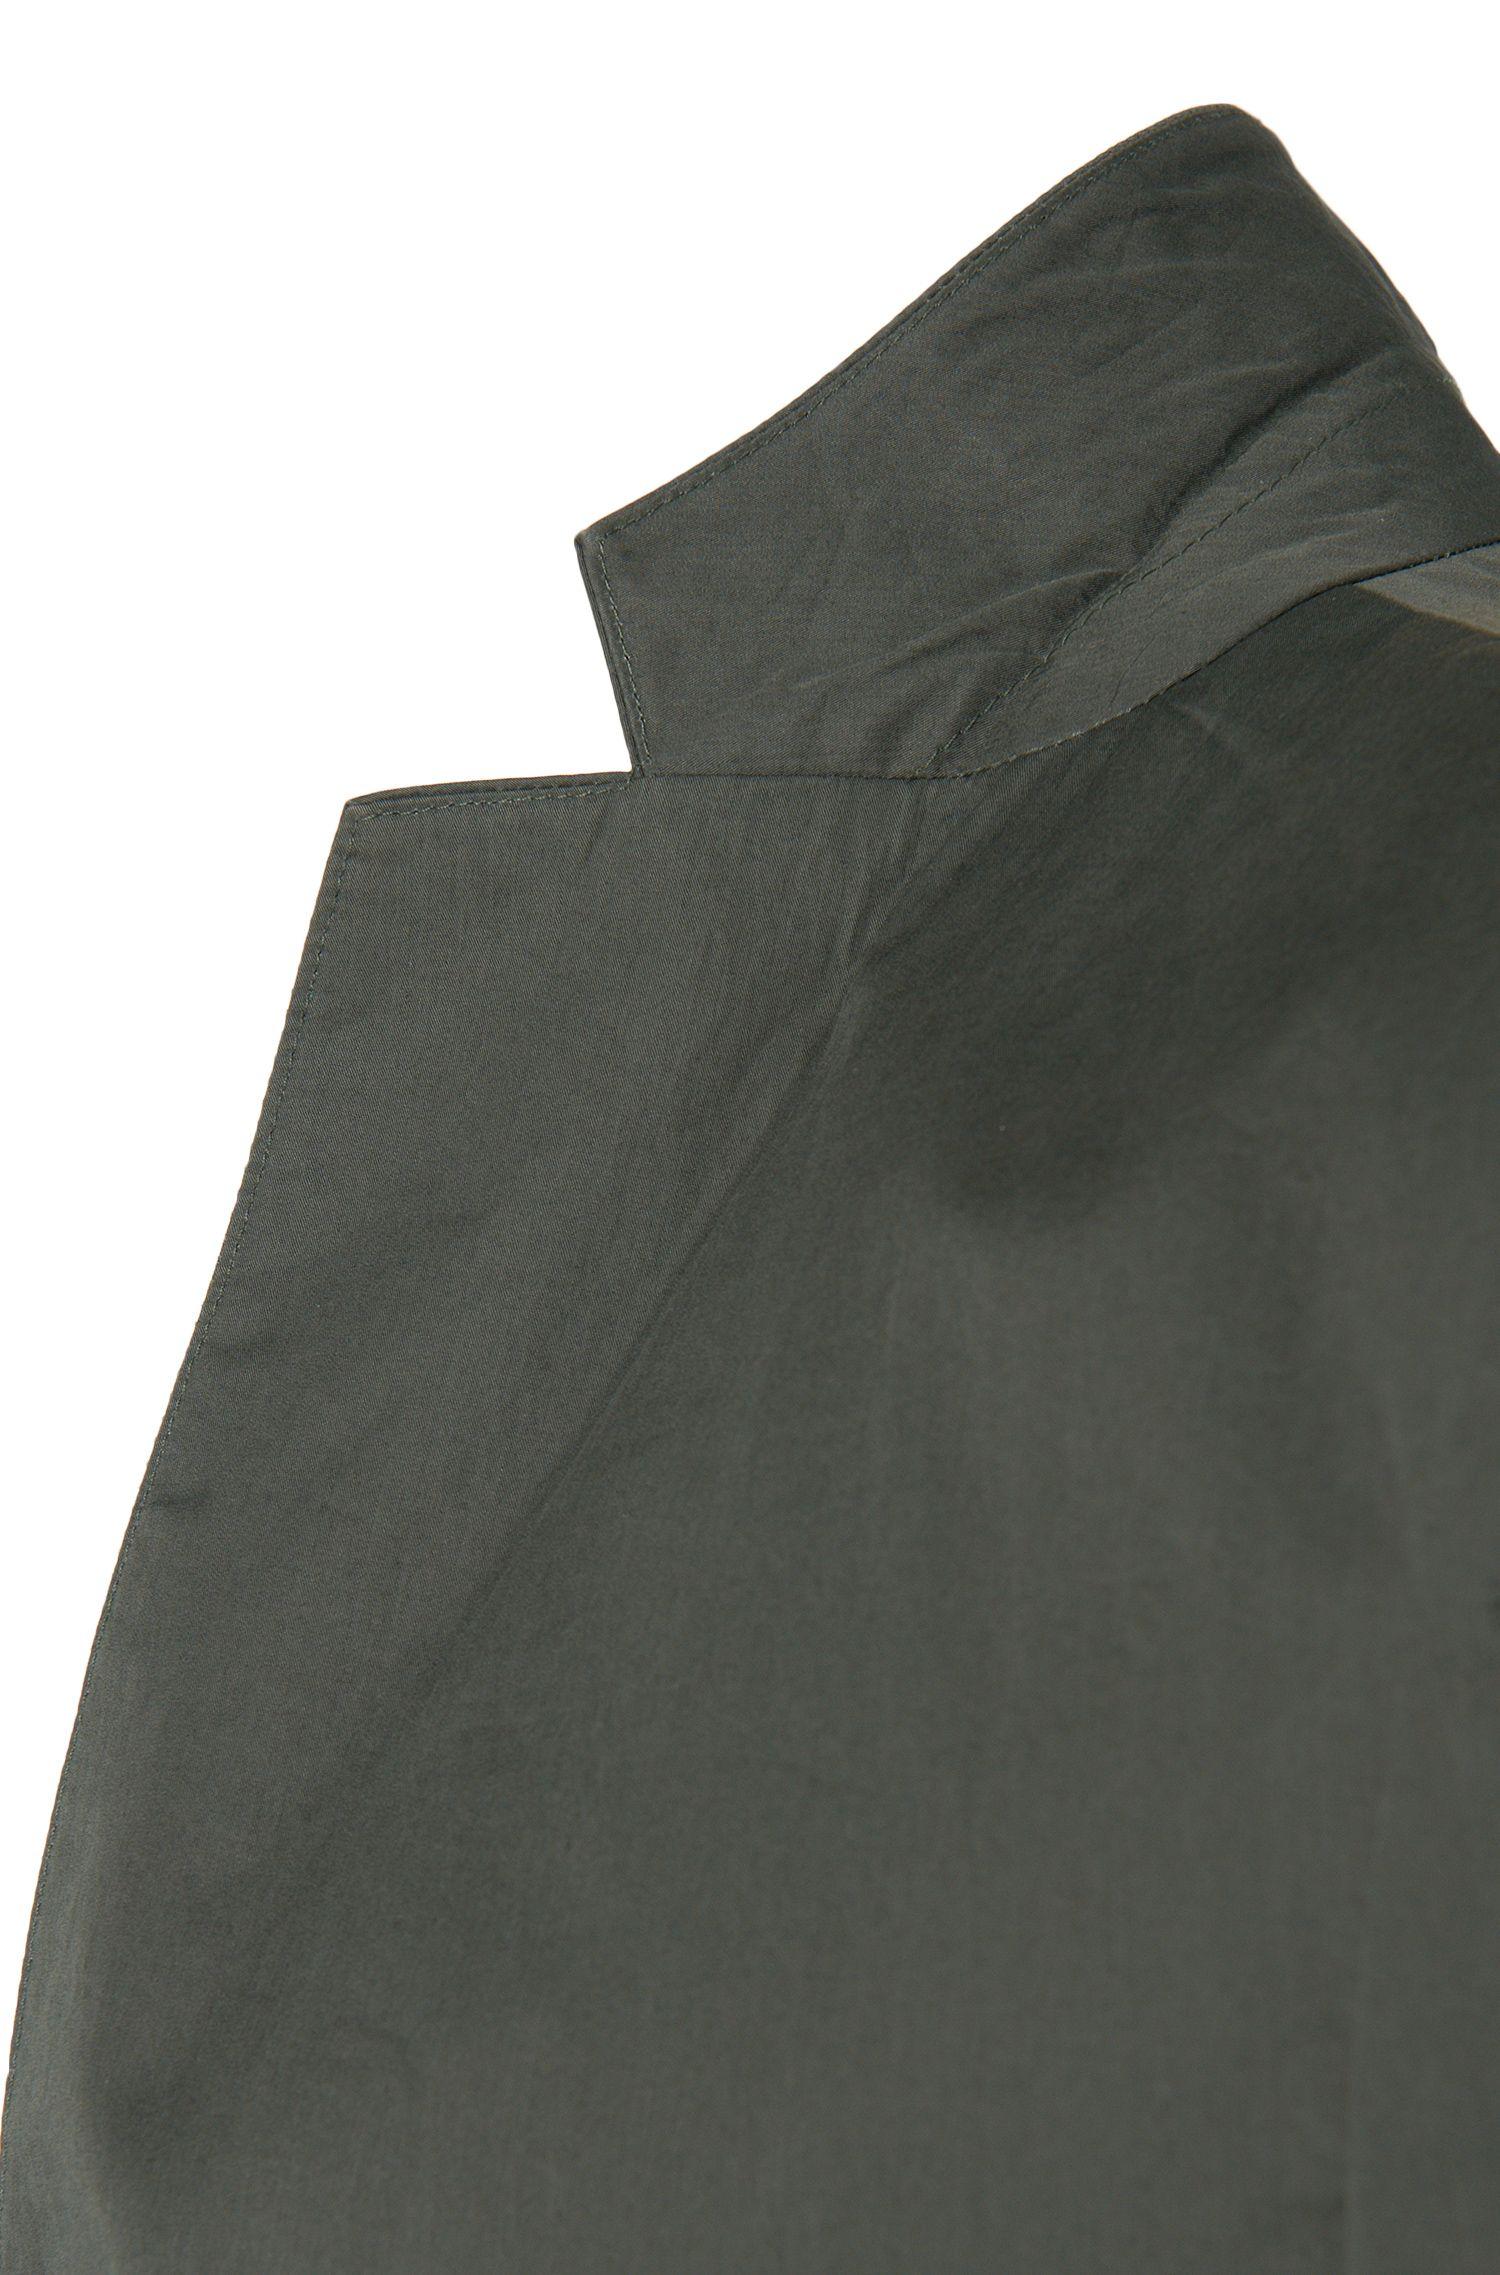 Italian Cotton Suit, Slim Fit | Nastven/Barns-T, Dark Green